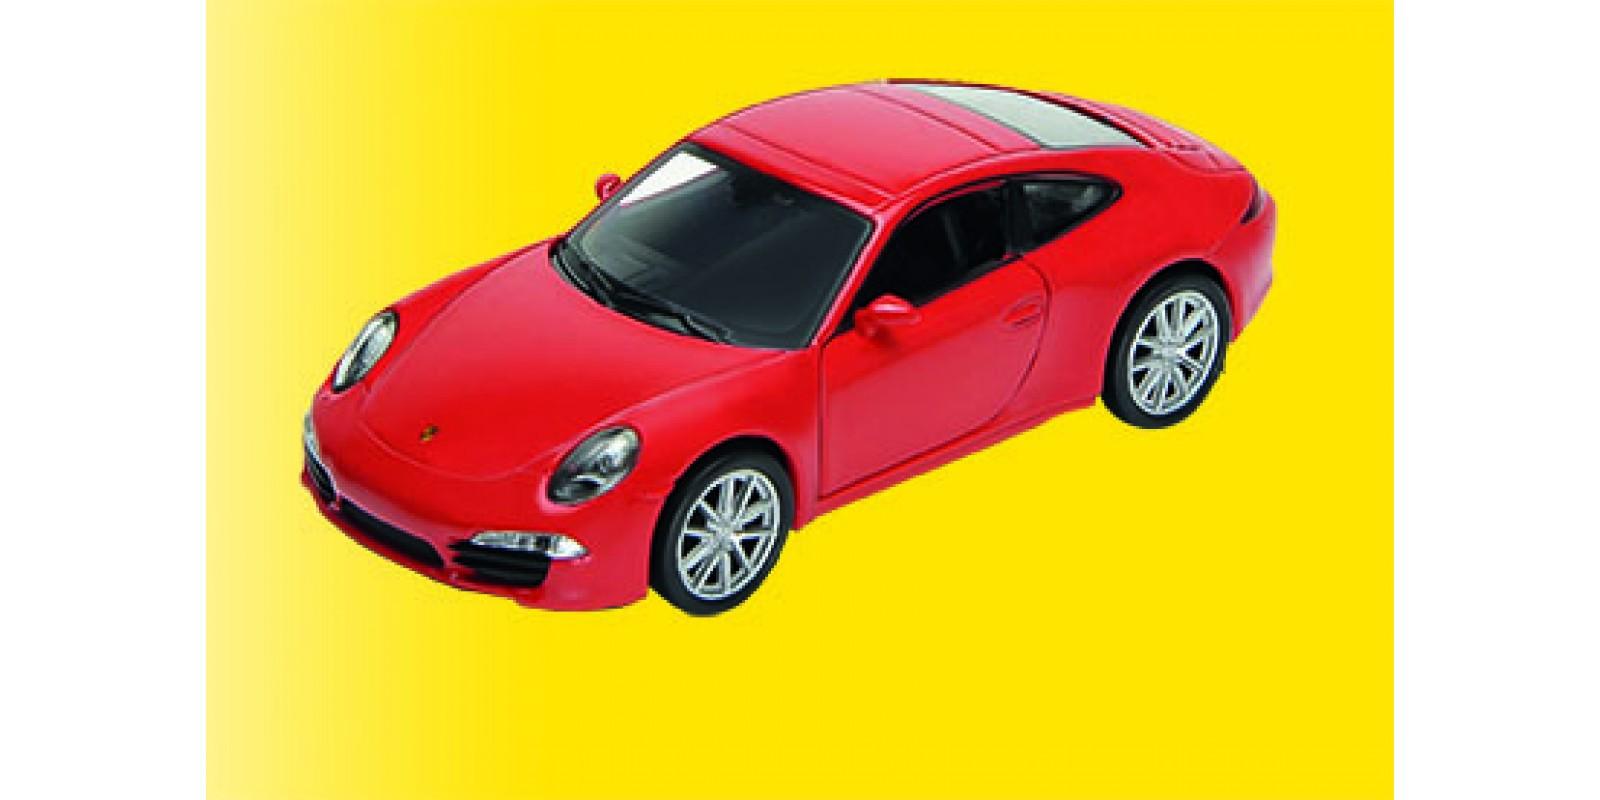 Vo41611 H0 Porsche 911 Carrera S, red, finished model